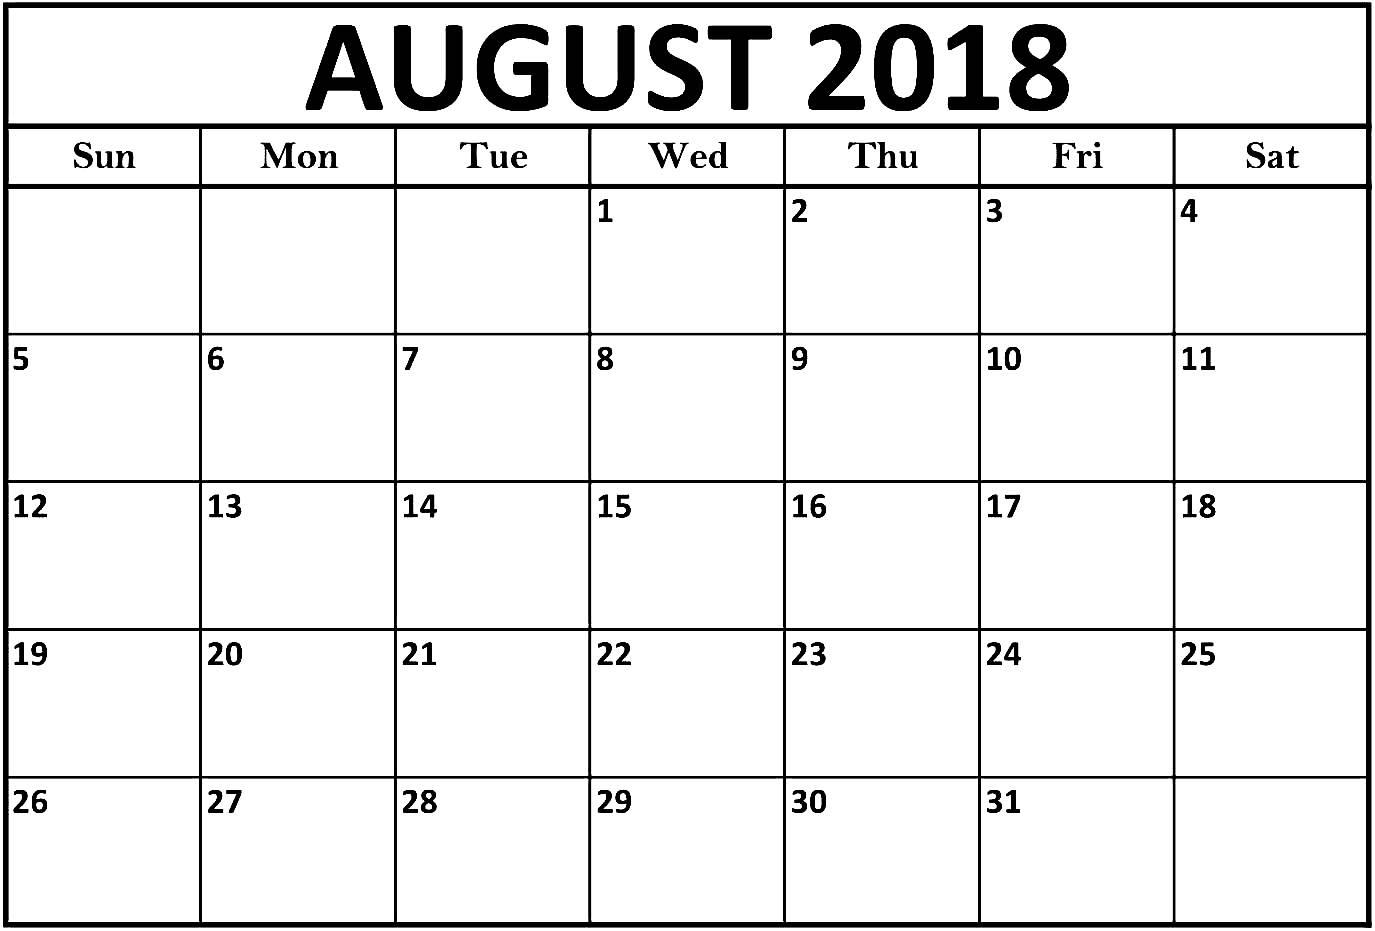 august 2018 calendar printable template best calendar printable Calendar August 2018 Printable Uk erdferdf